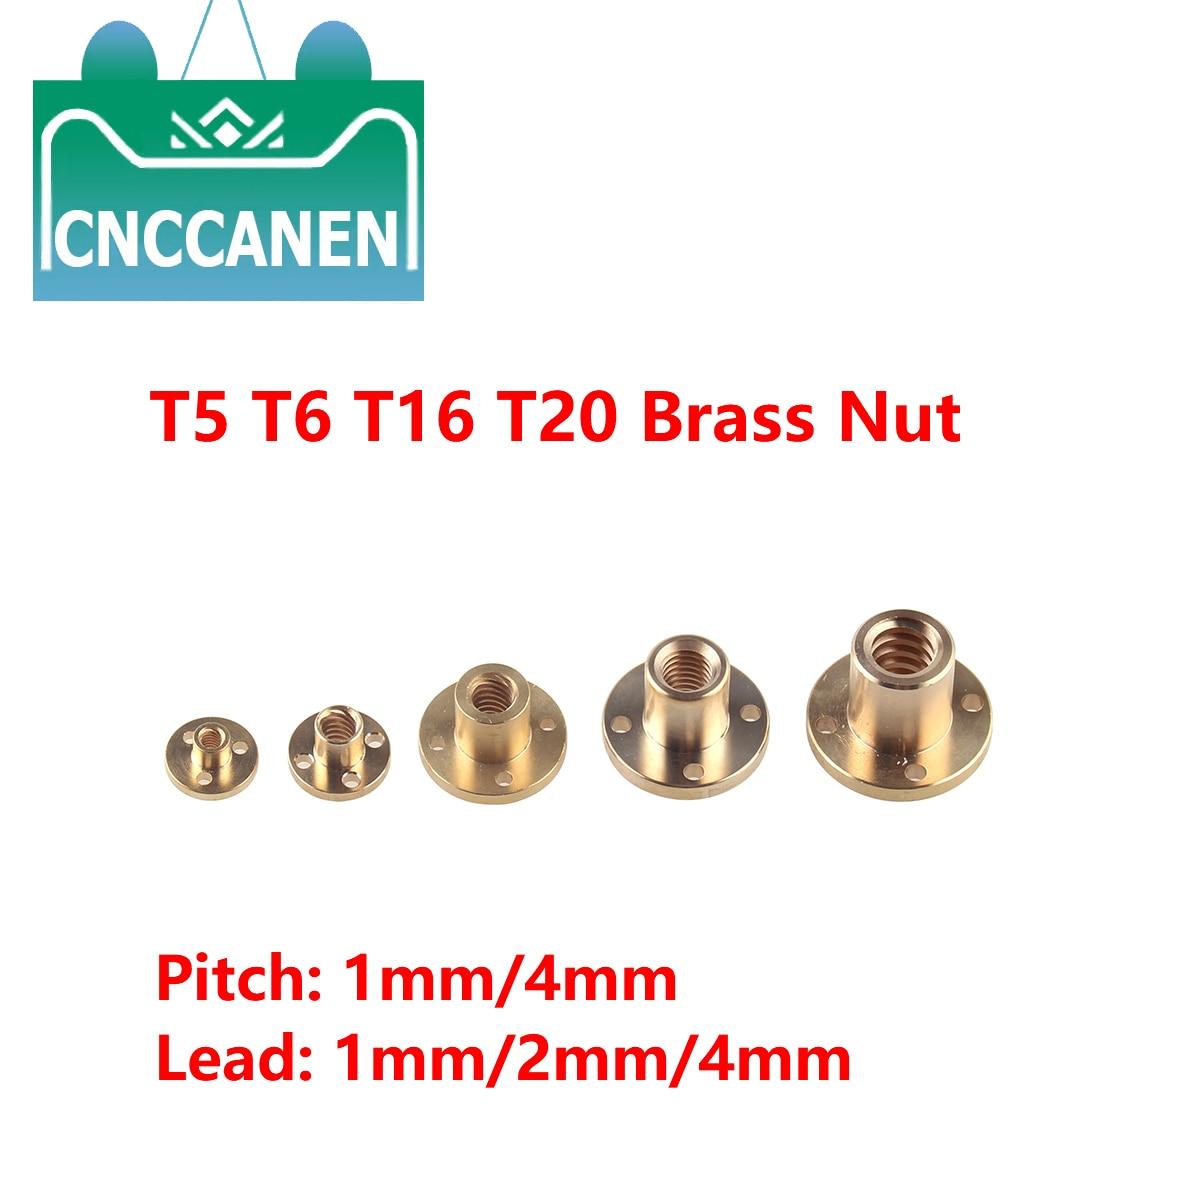 Tuerca de tornillo de plomo T5 T6 T16 T20 1mm/2mm de plomo 1mm/2mm/4mm tuerca de tornillo de plomo de latón para piezas CNC accesorios de impresora 3D